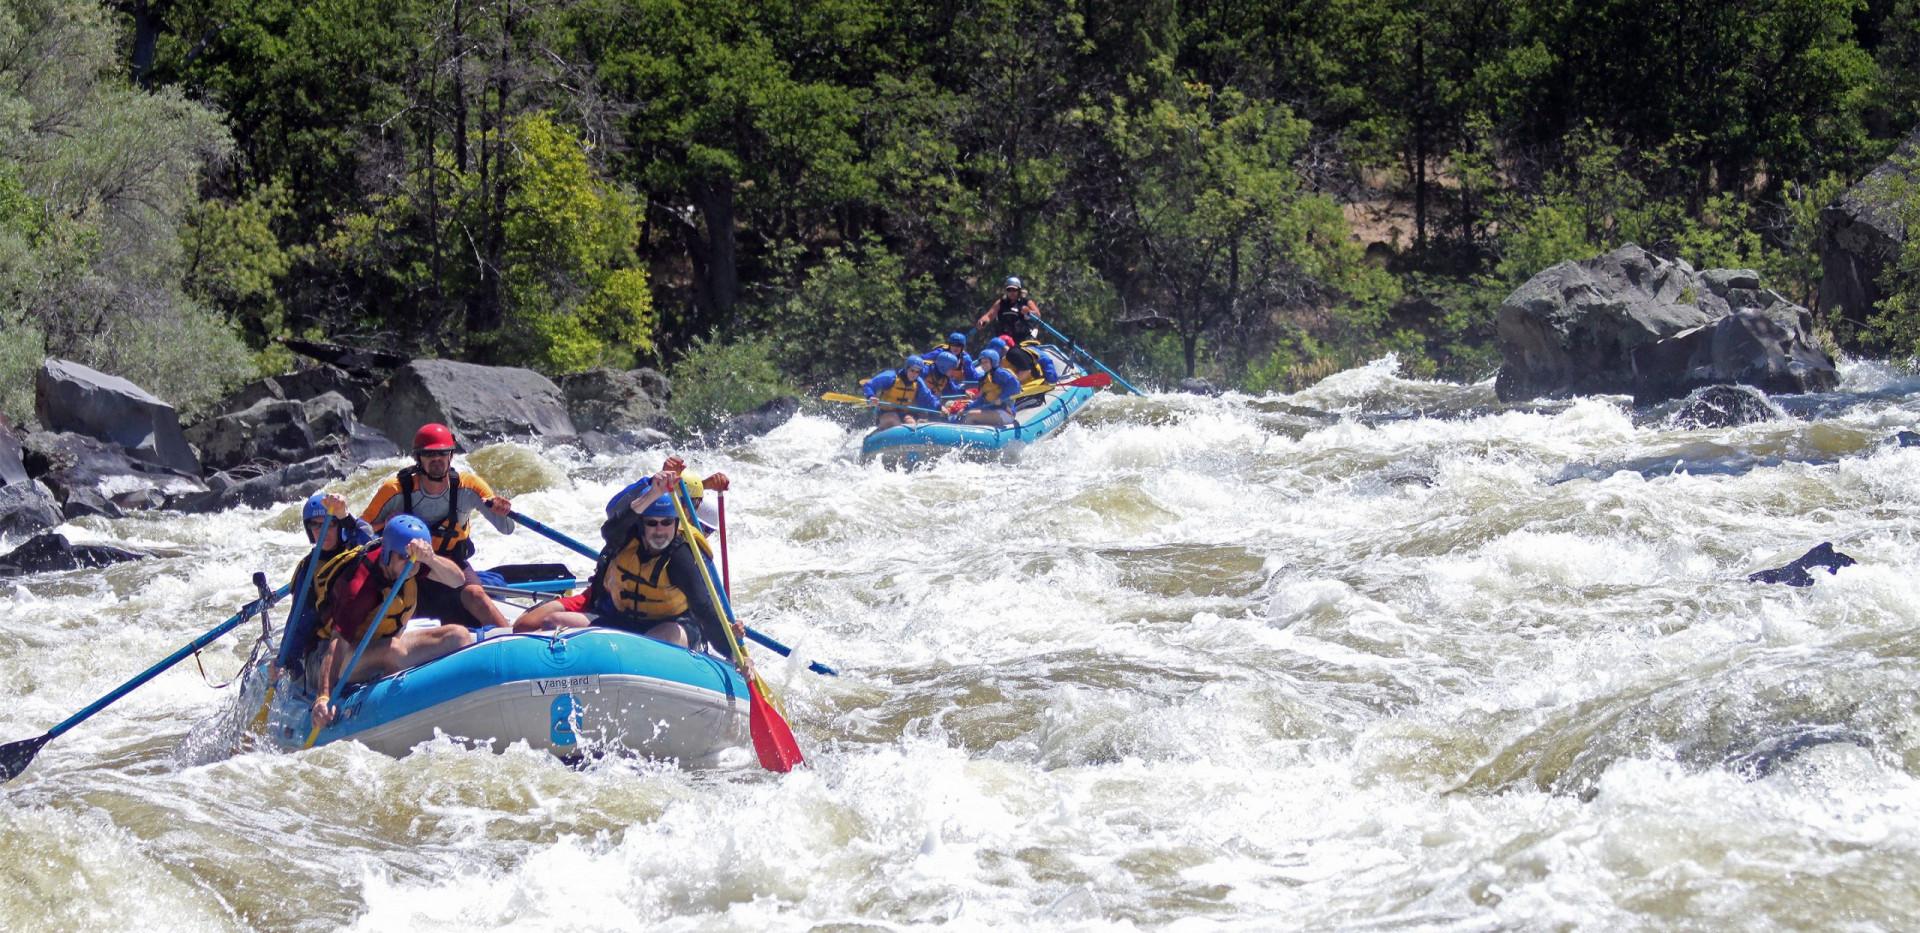 Upper Klamath River - Whitewater Rafting - Adventure